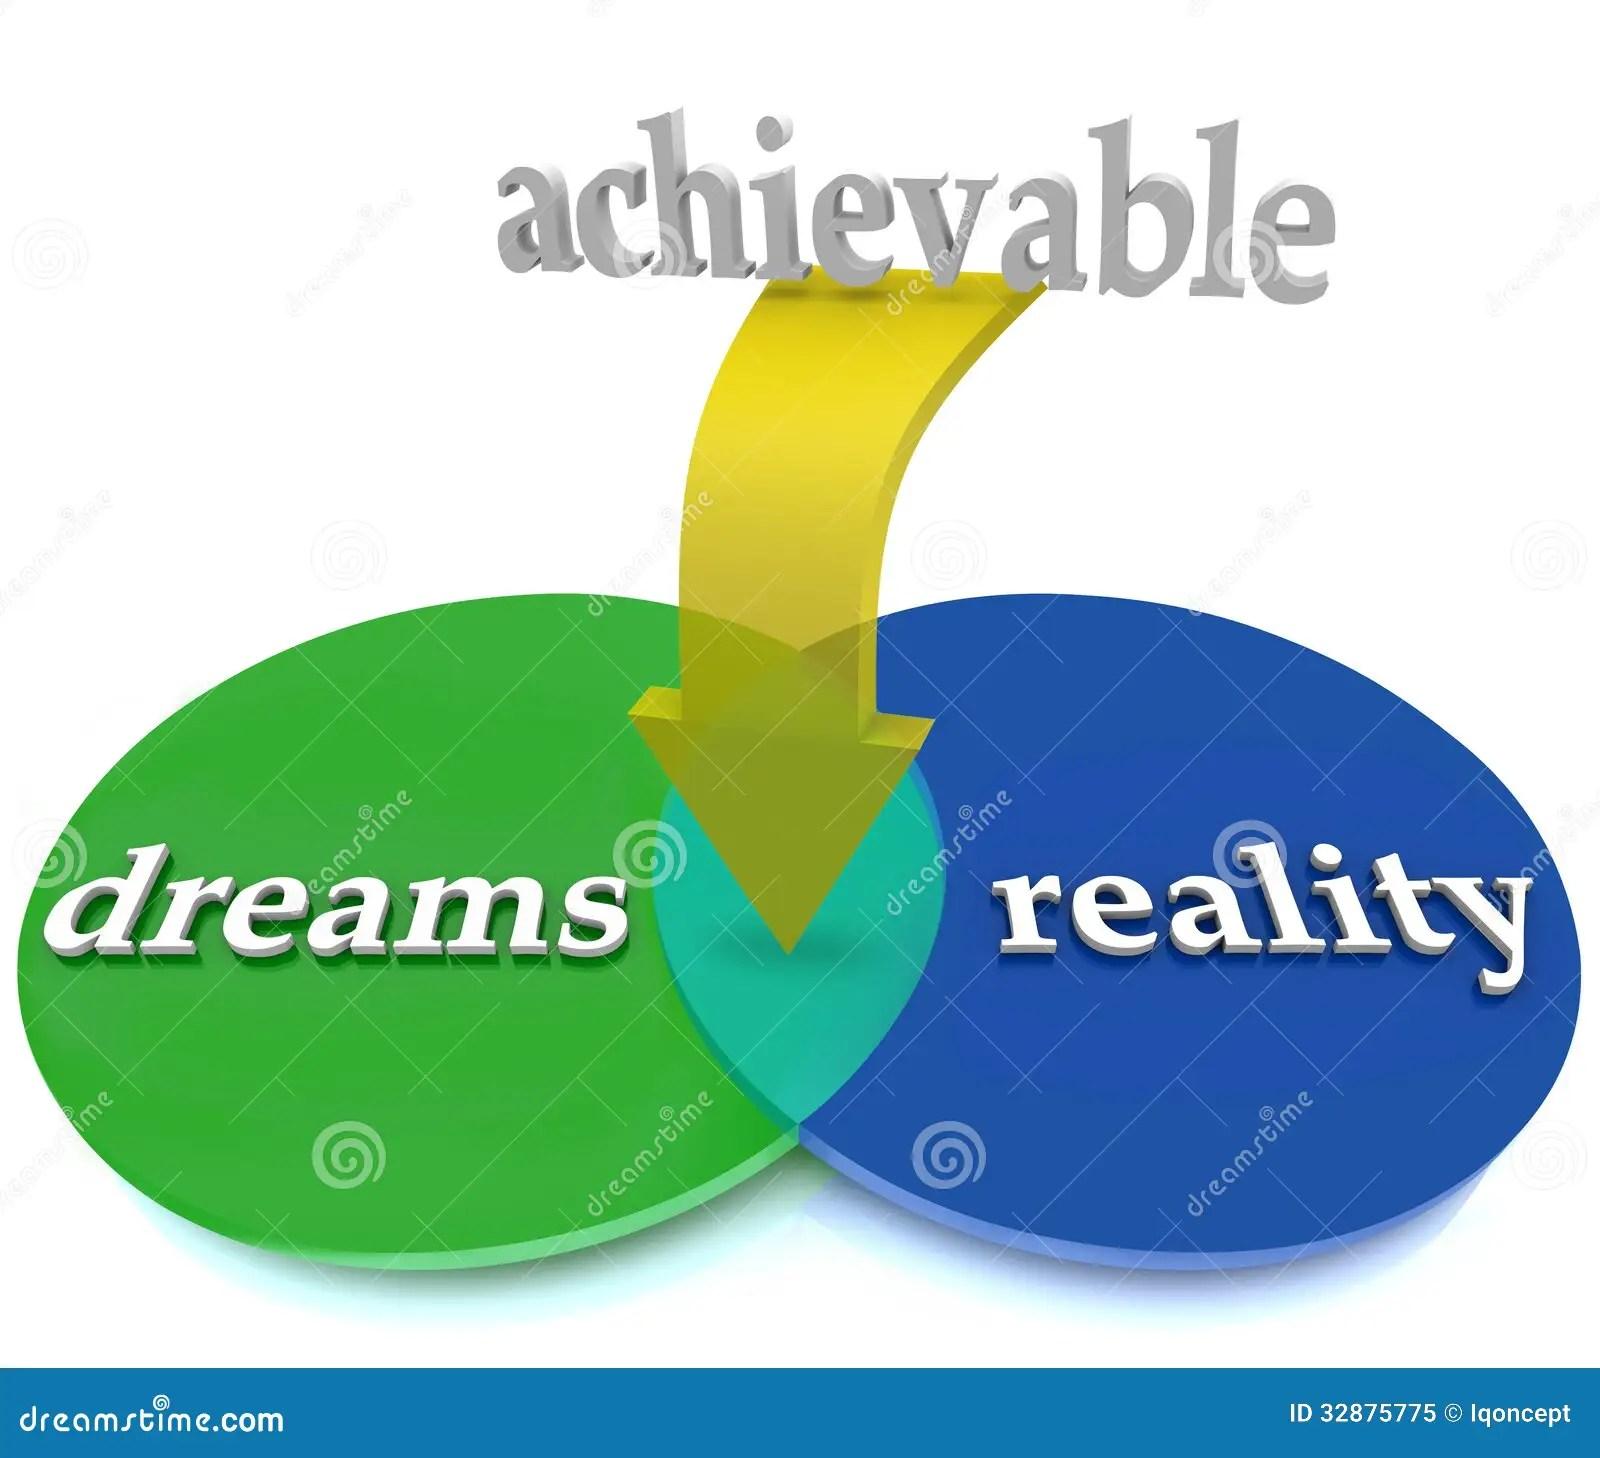 Dreams Vs Reality Venn Diagram Overlapping Achievable